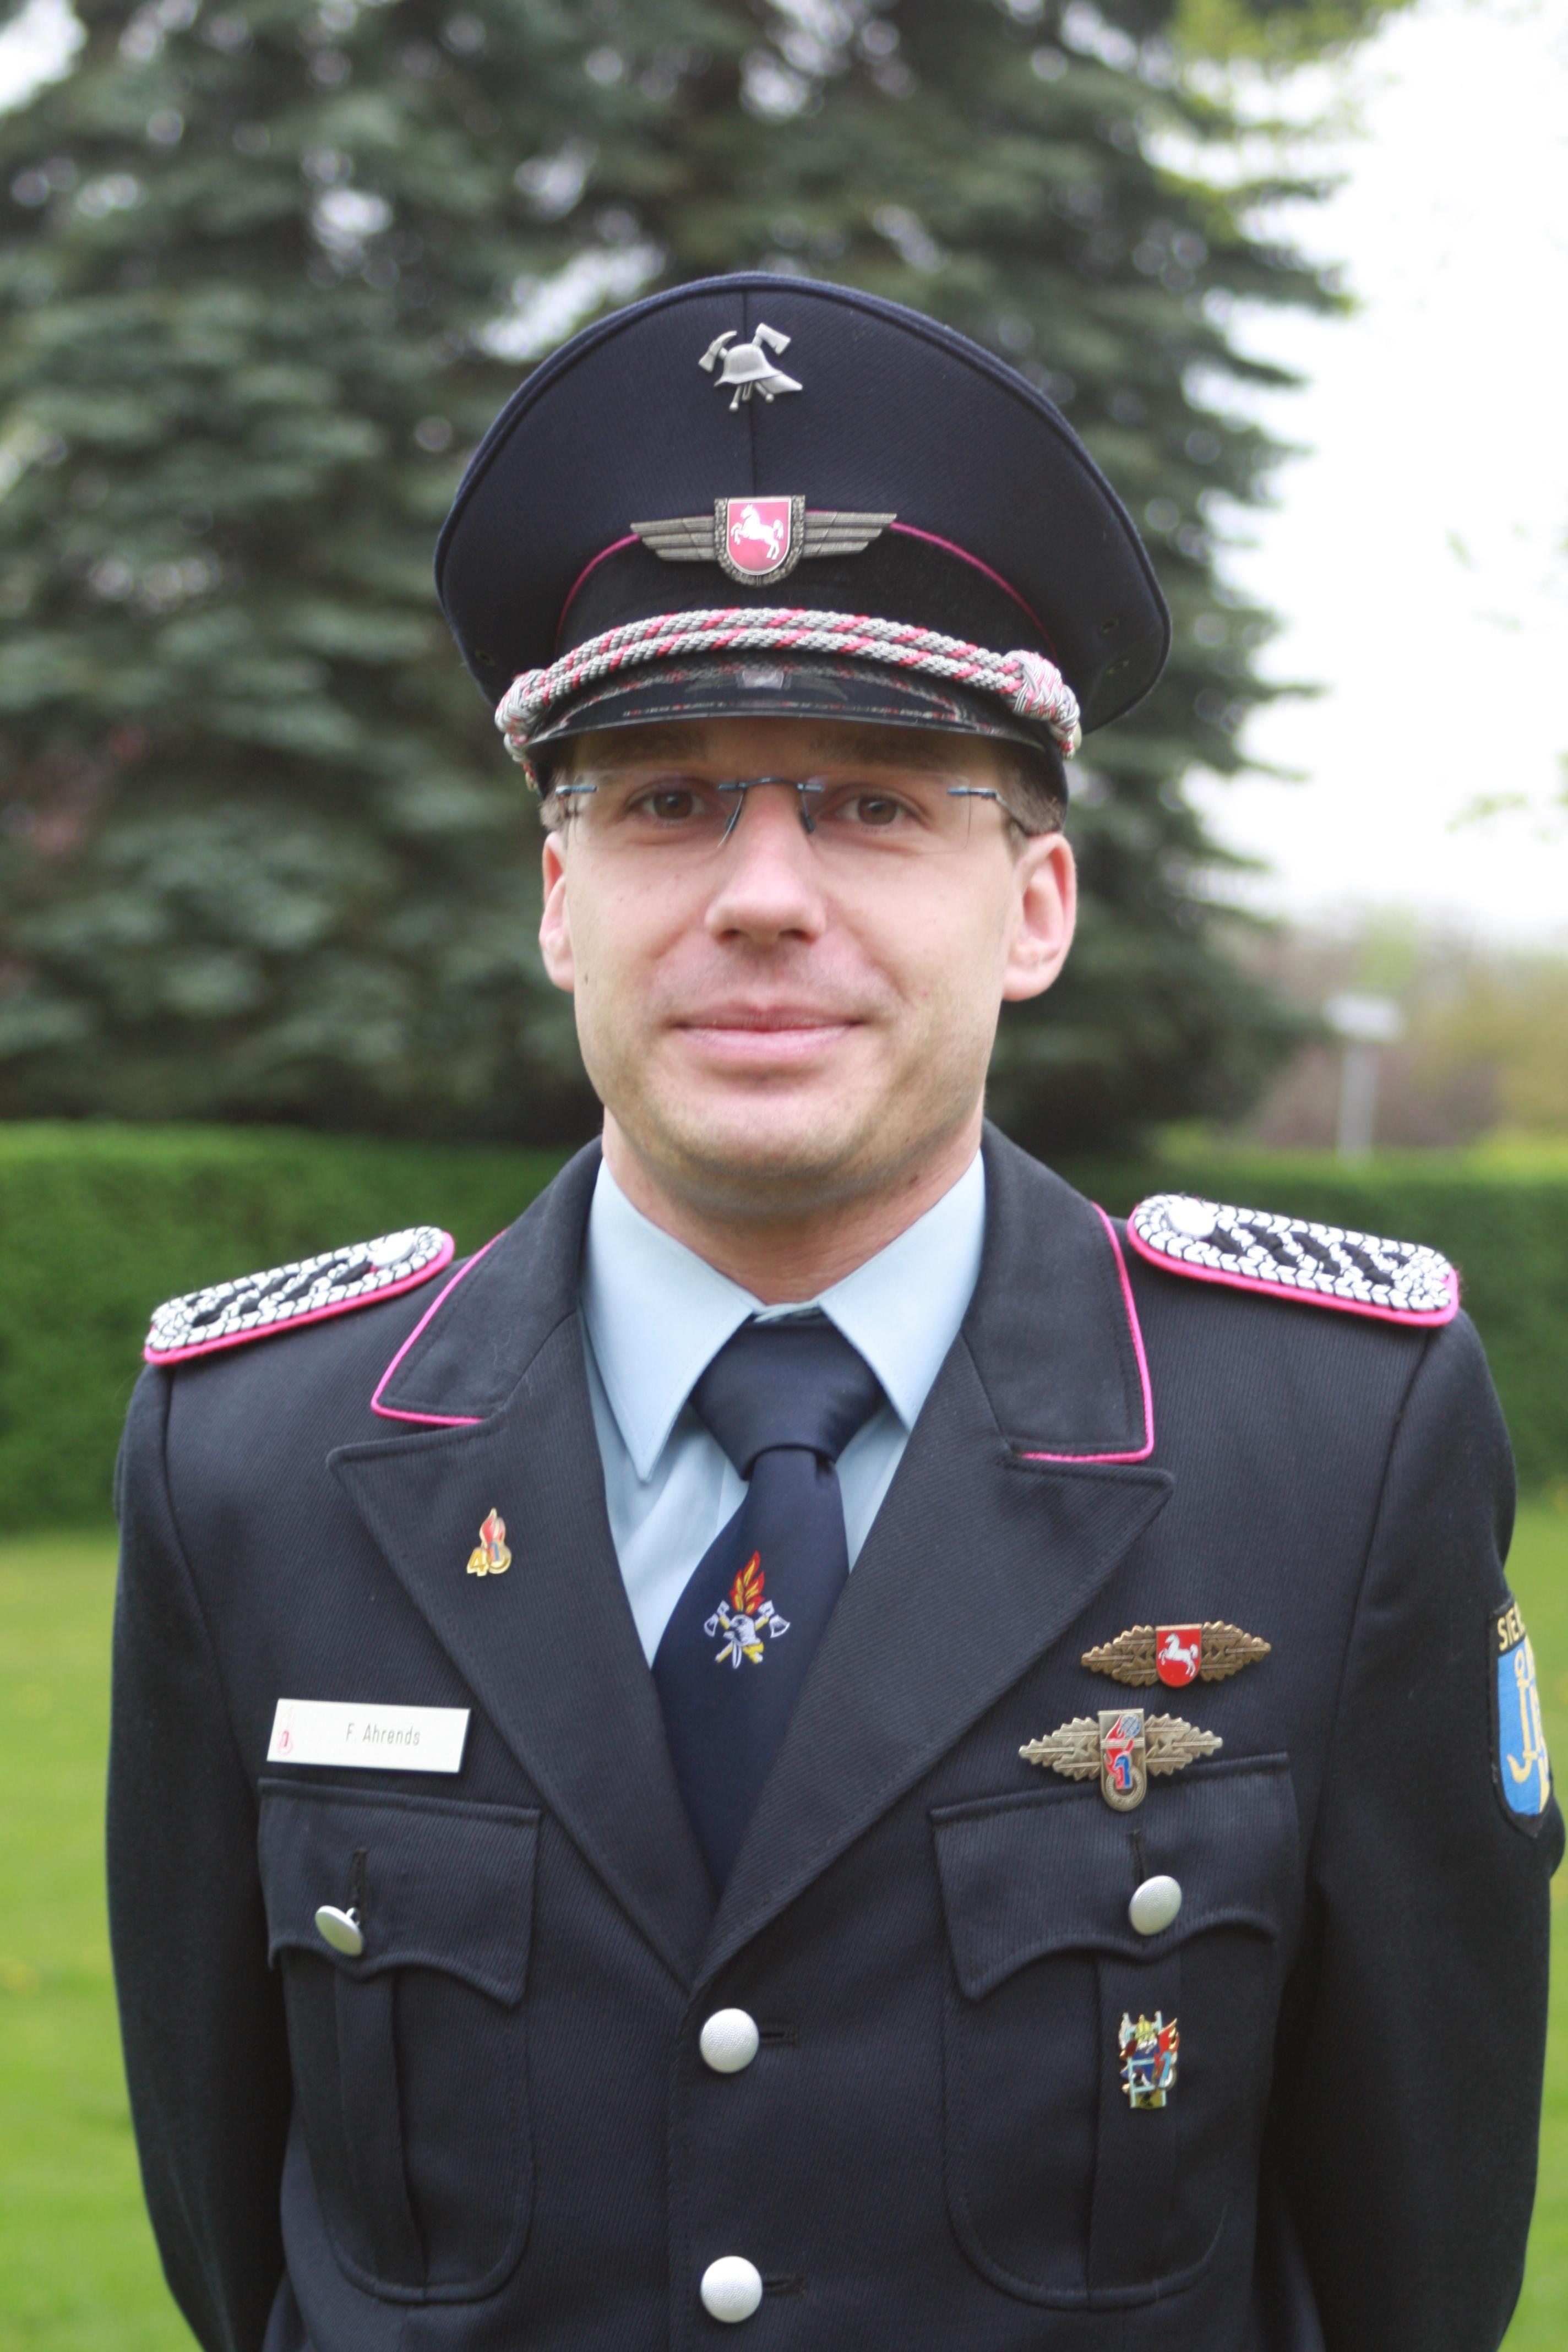 FlorianLuxkomp